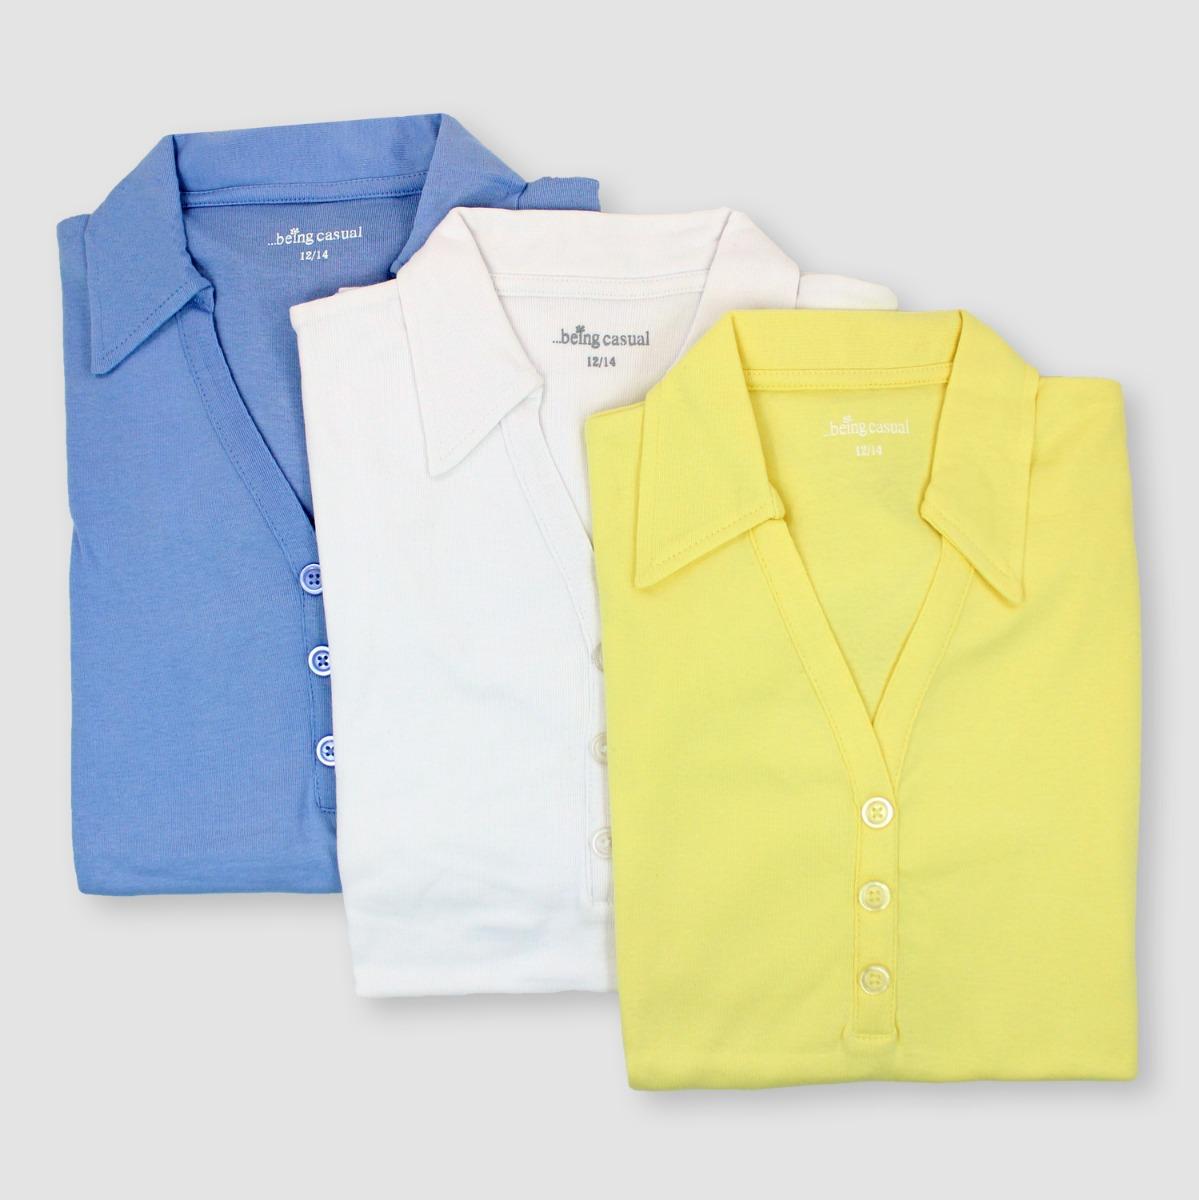 ebb915da055e1d 3 PACK Womens Polo Jersey Tops T Shirts V Neck Short Sleeved ...